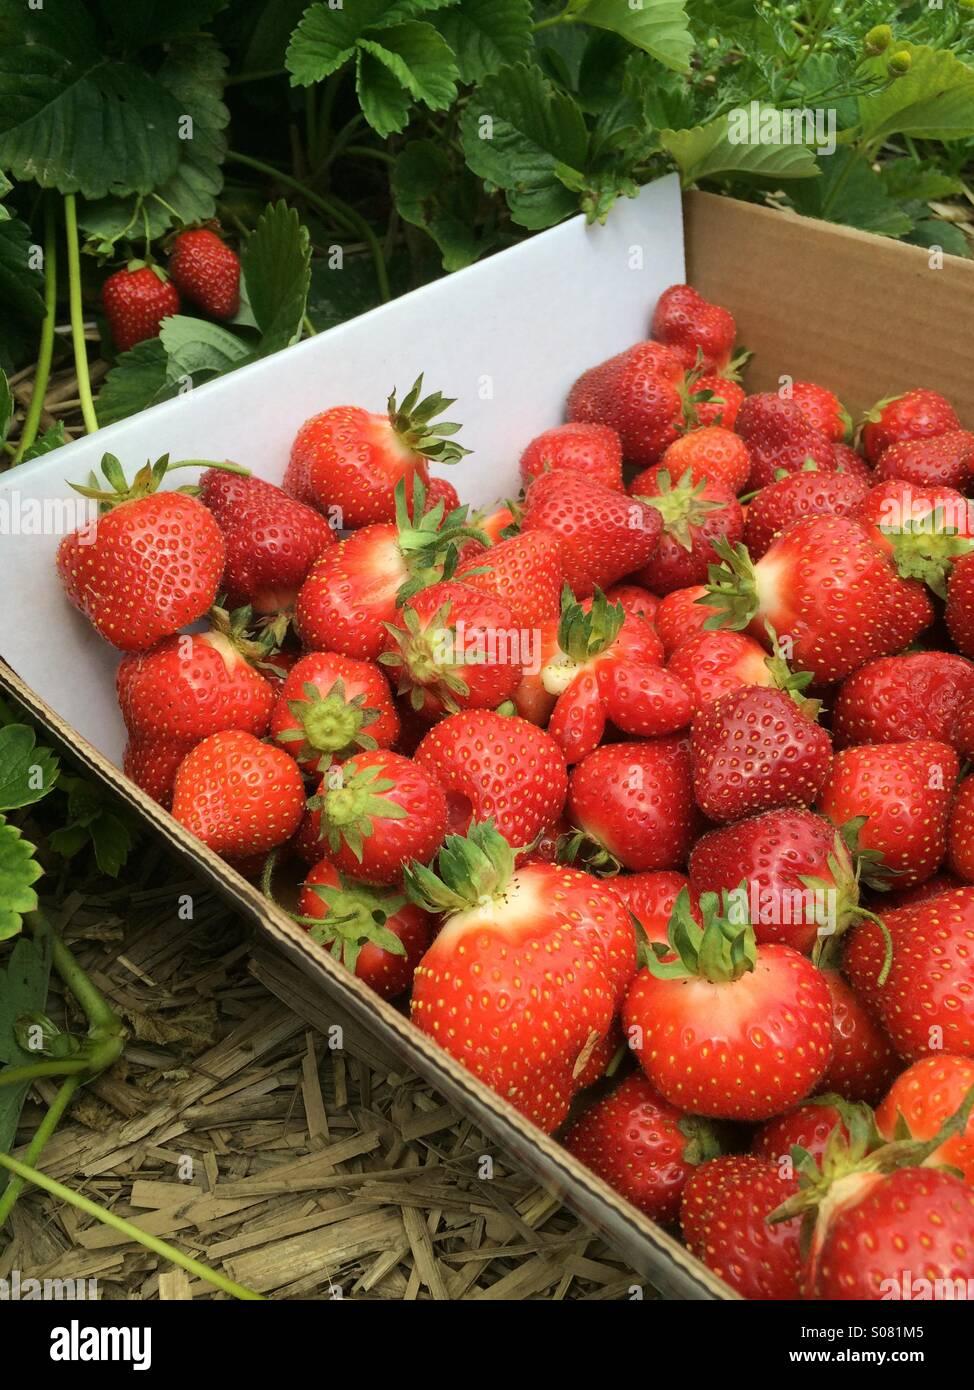 Recogida de fresas. Imagen De Stock